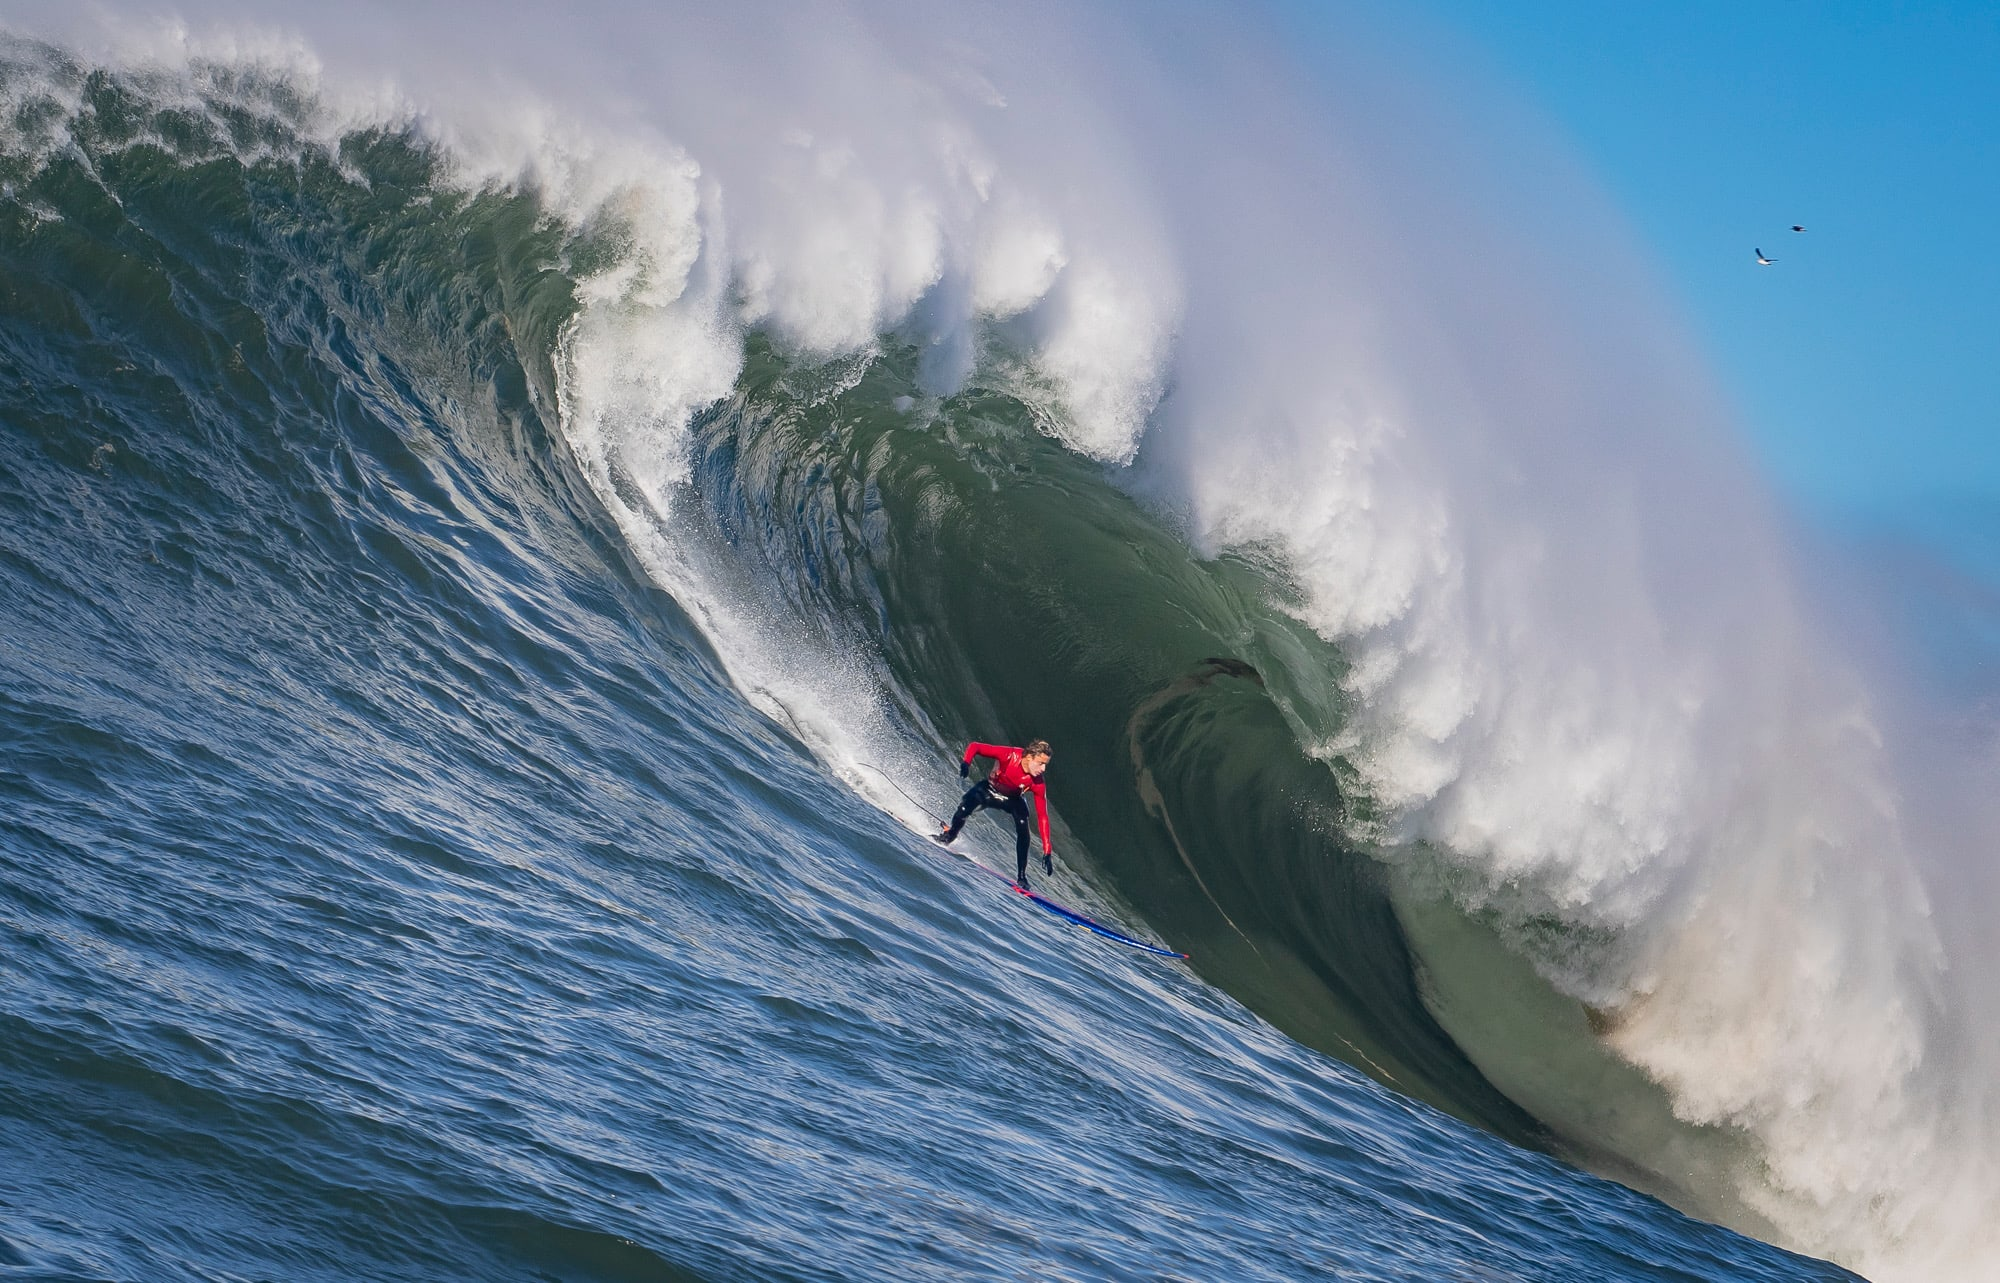 Ridge Lenny surfing mavericks California